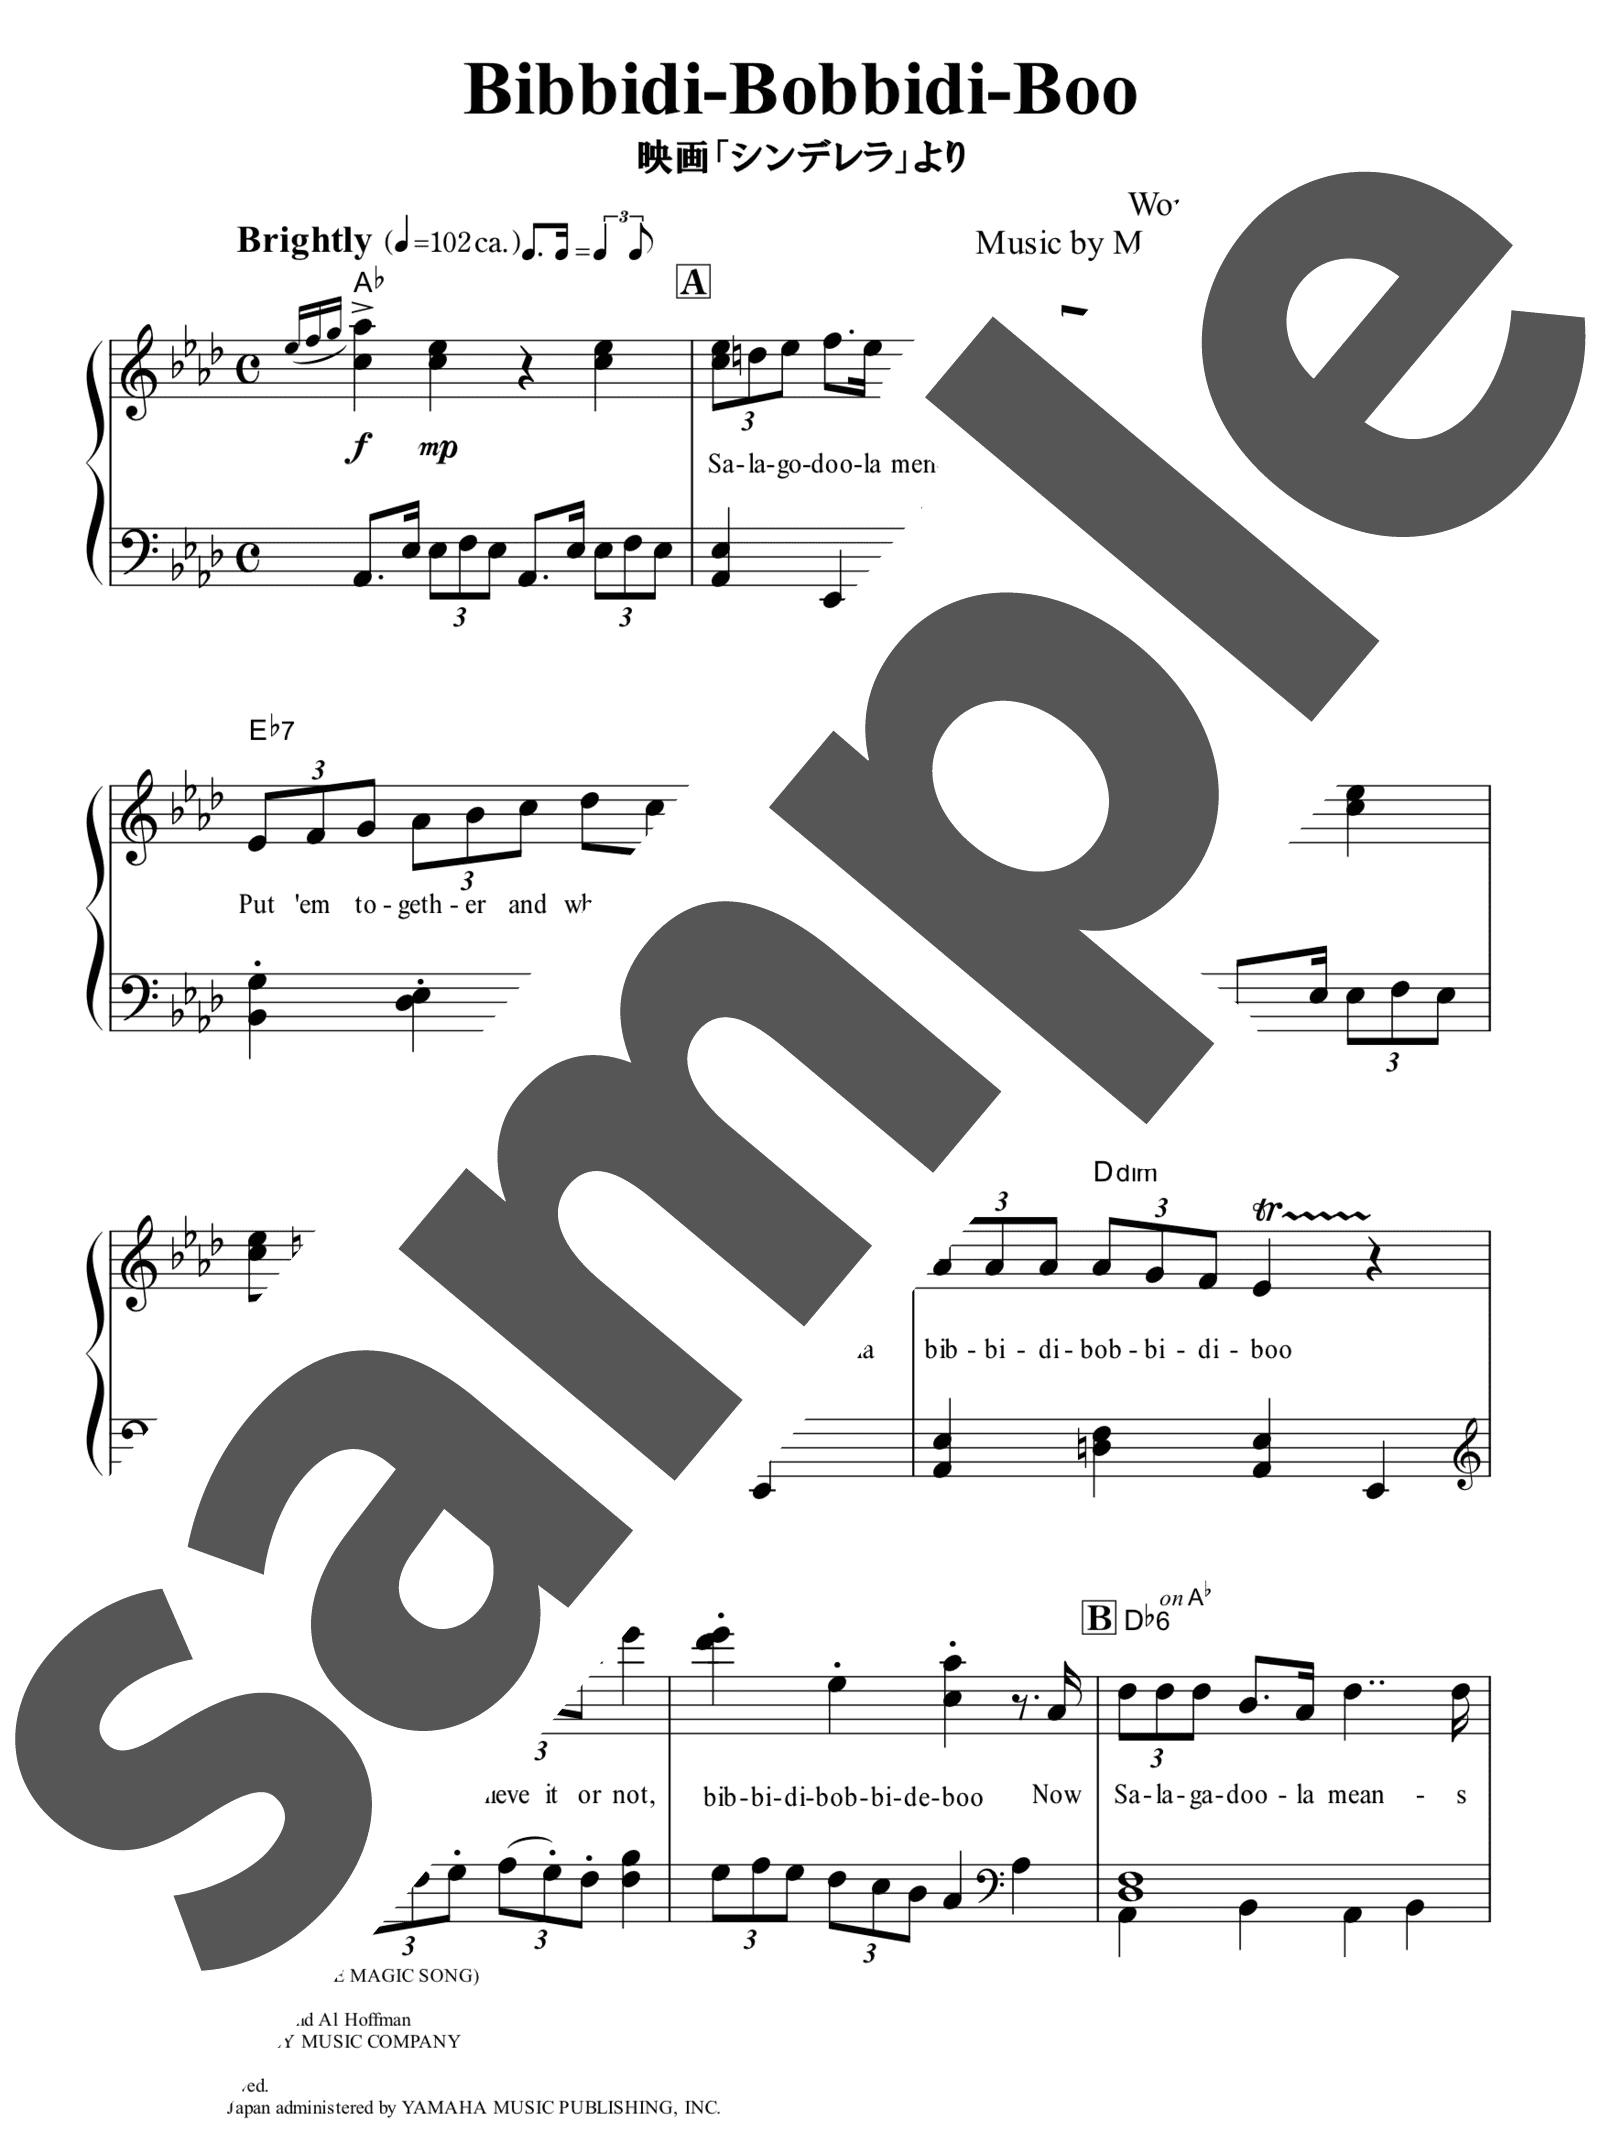 「Bibbidi-Bobbidi-Boo」のサンプル楽譜